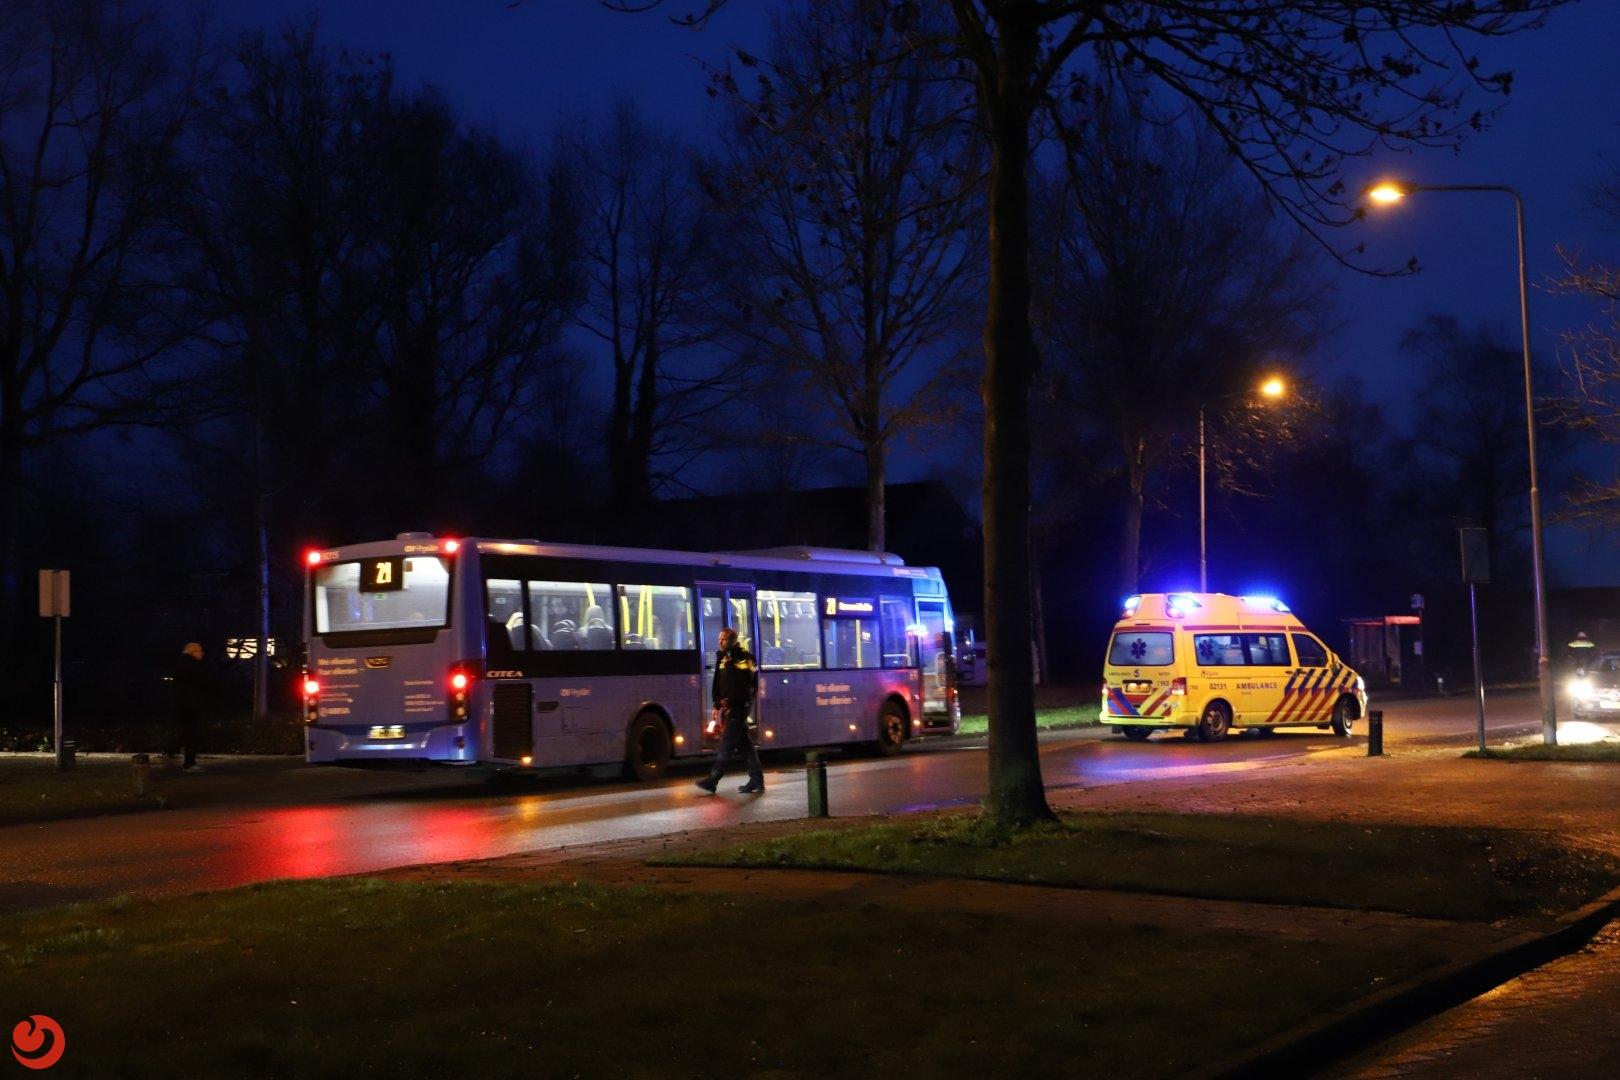 Vrouw ernstig gewond na val op straat